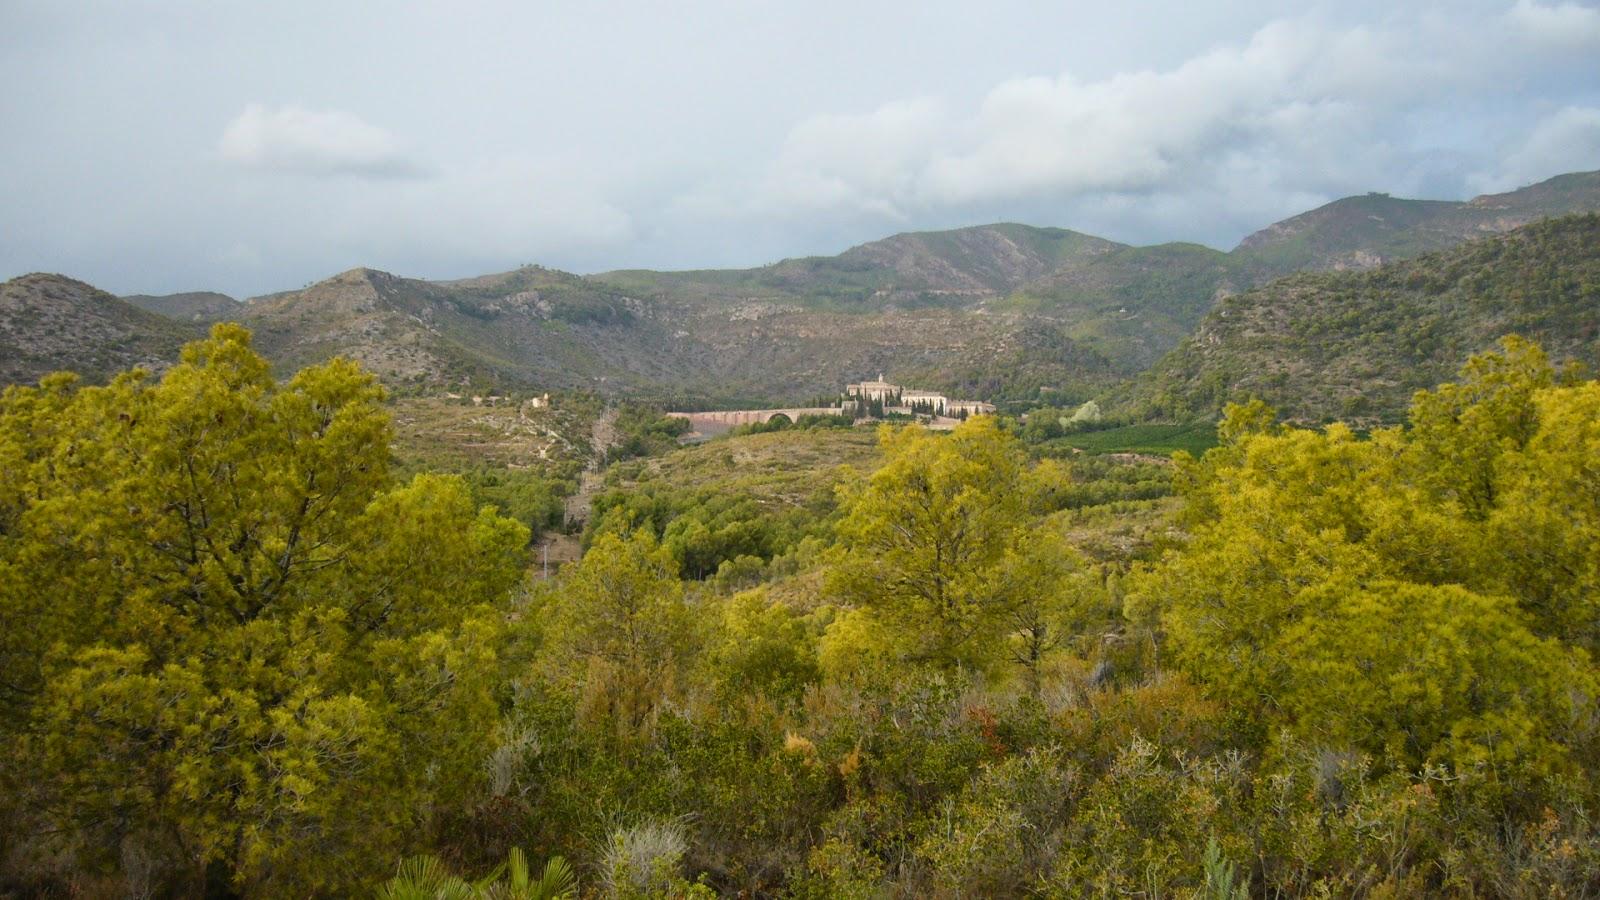 Mirador de la Pedrera PortaCoeli